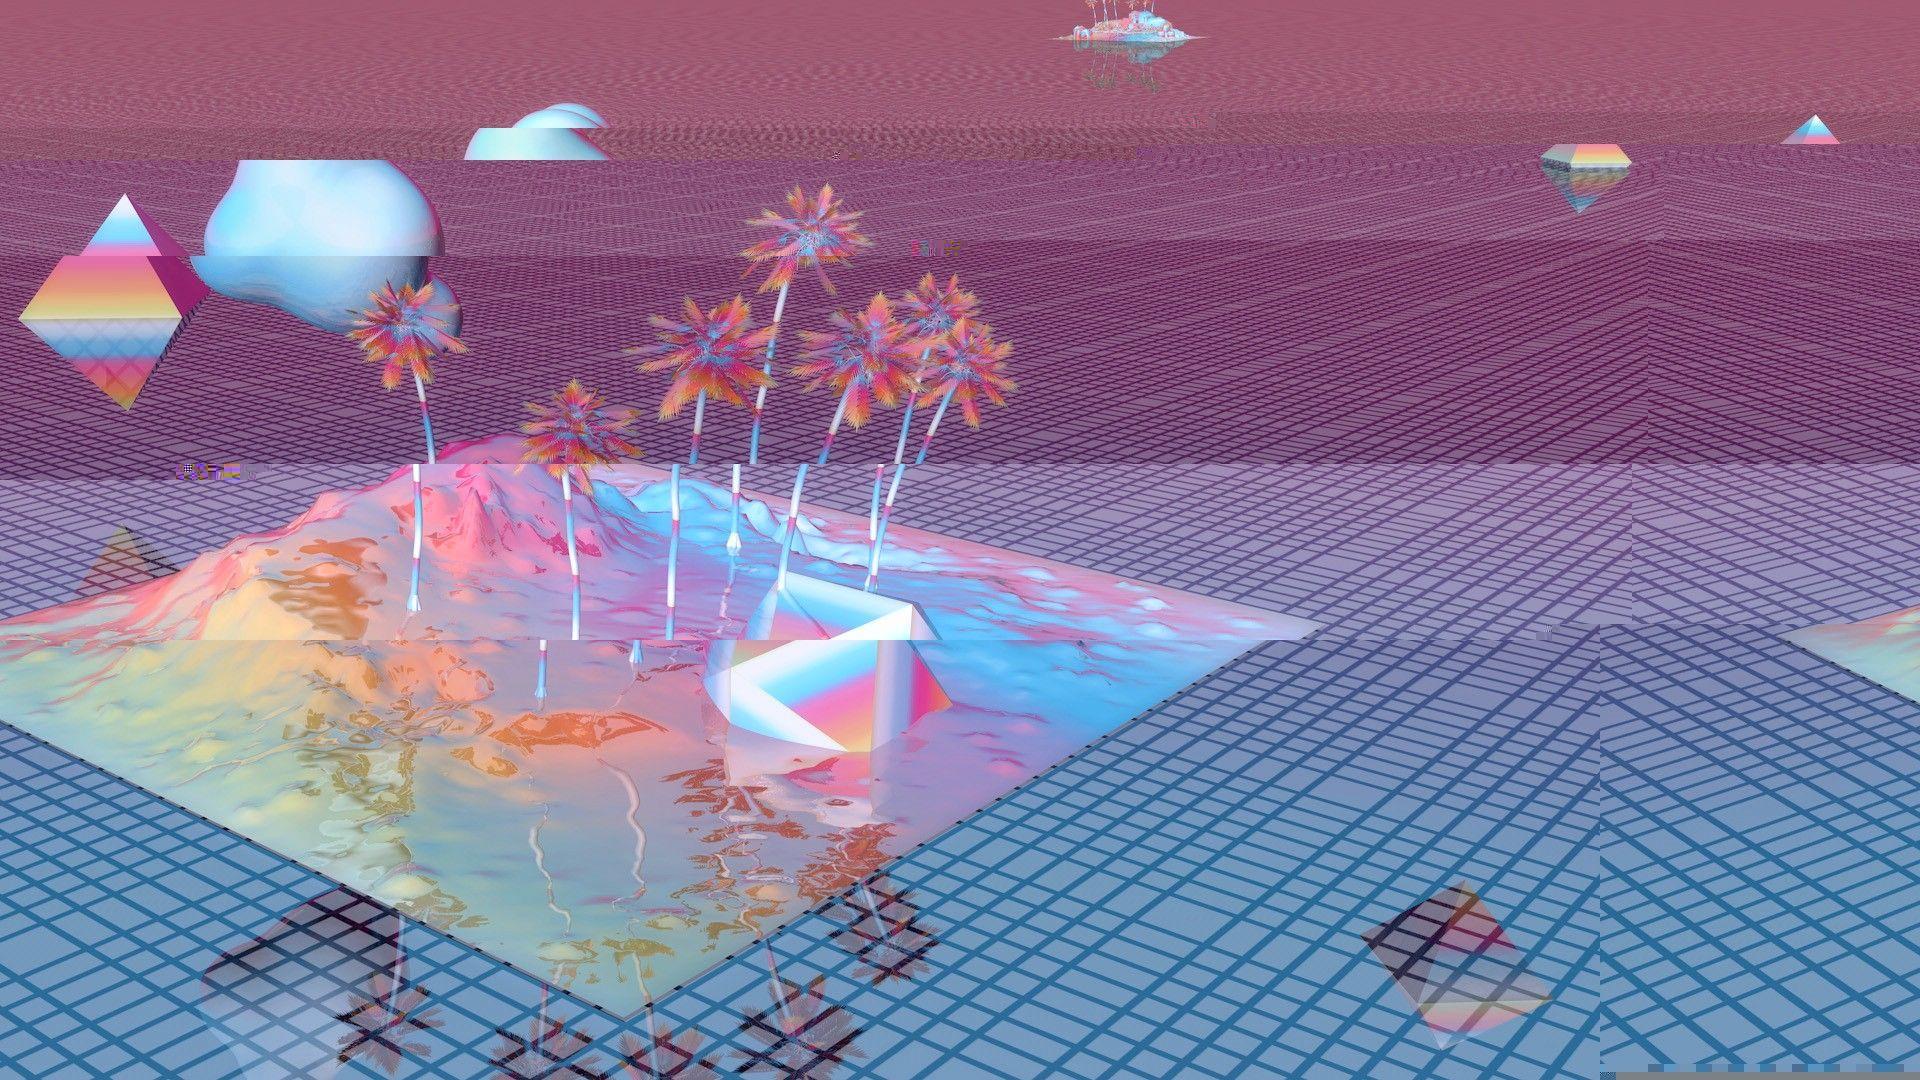 Vaporwave Desktop Wallpapers Top Free Vaporwave Desktop